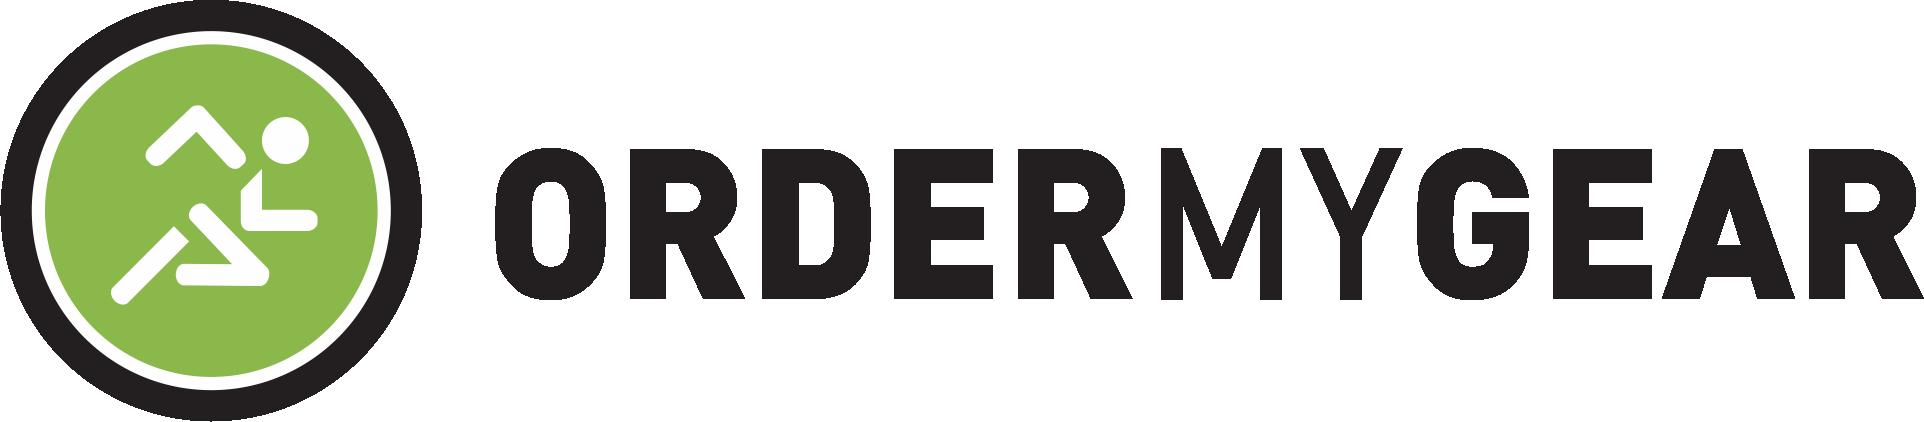 OrderMyGear's logo